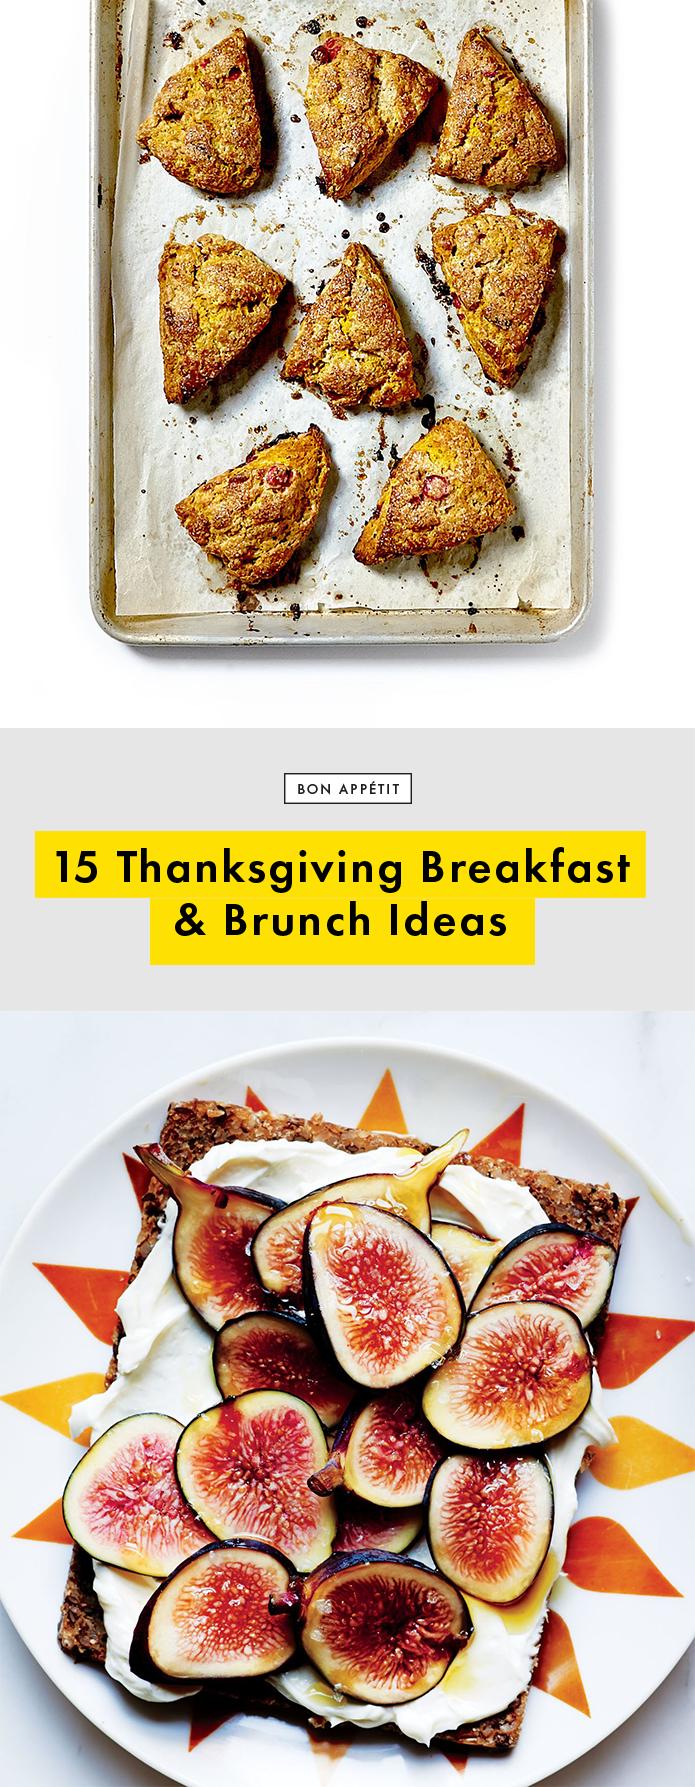 15 Thanksgiving Brunch Breakfast Recipe Ideas That Are Relatively Light Bon Appetit